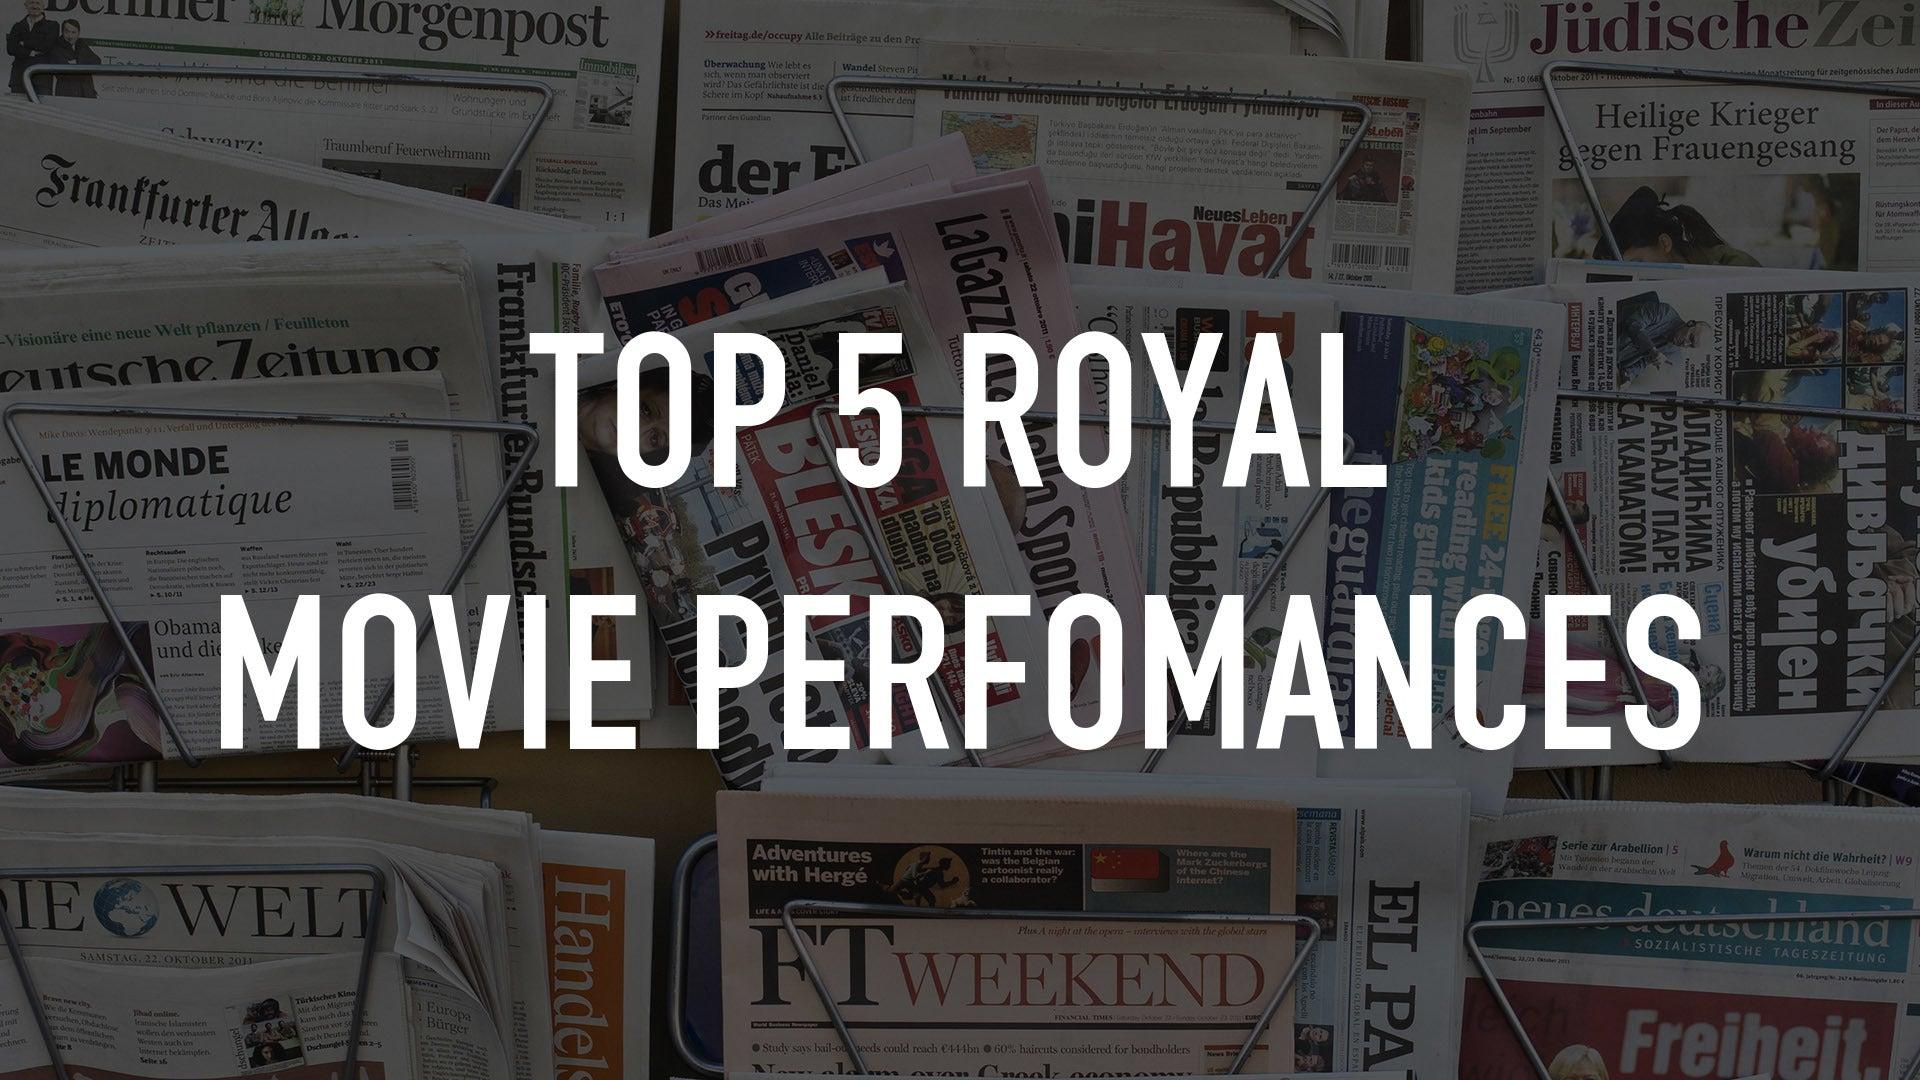 Top 5 Royal Movie Perfomances